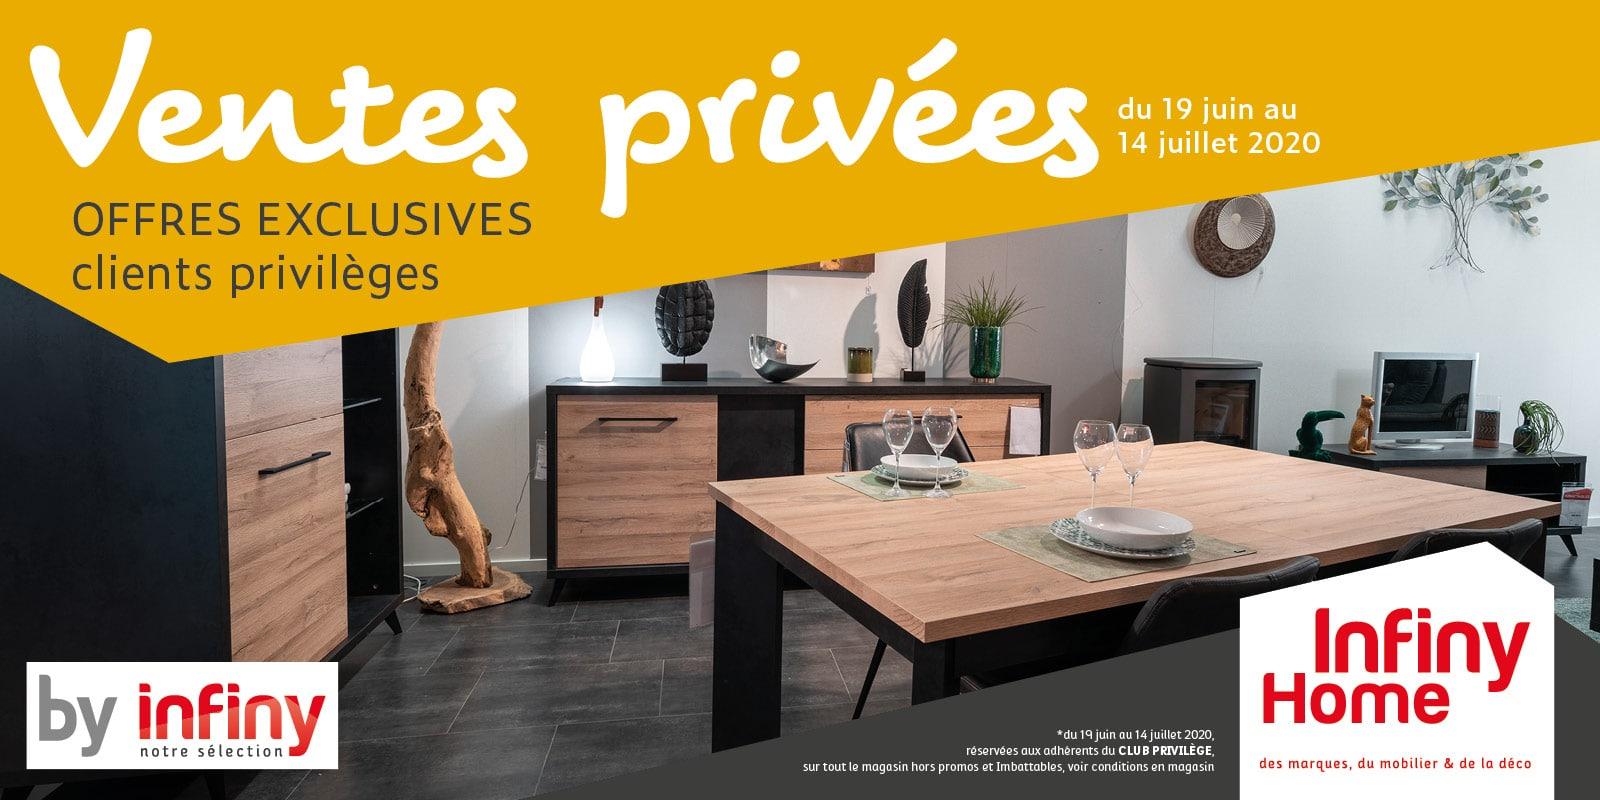 ventes privées By Infiny